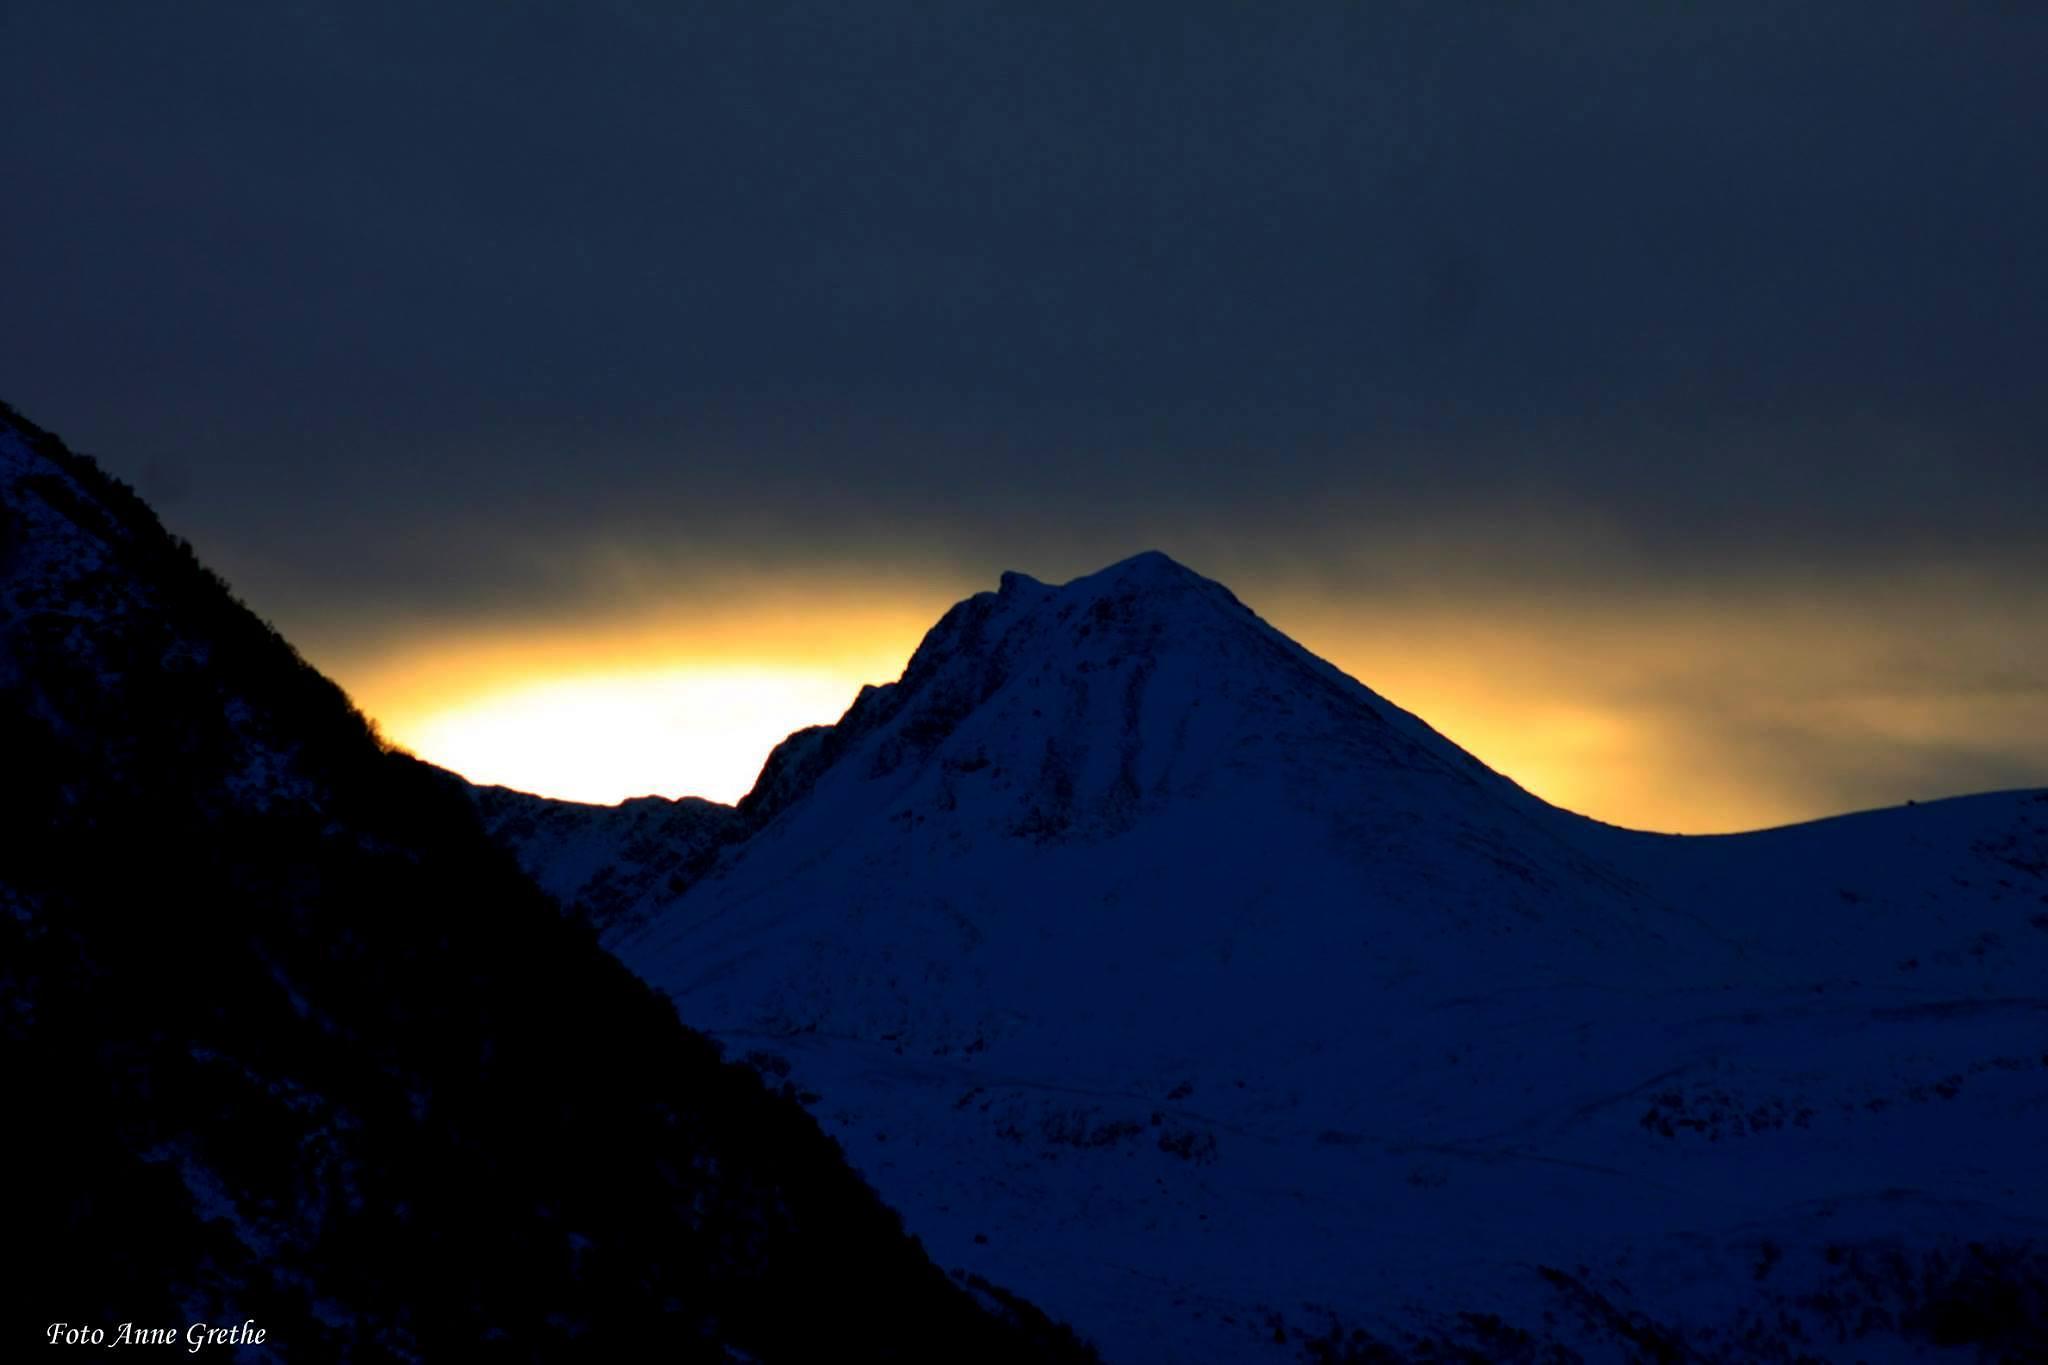 Winter light in western norway by Anne Grethe Eikrem